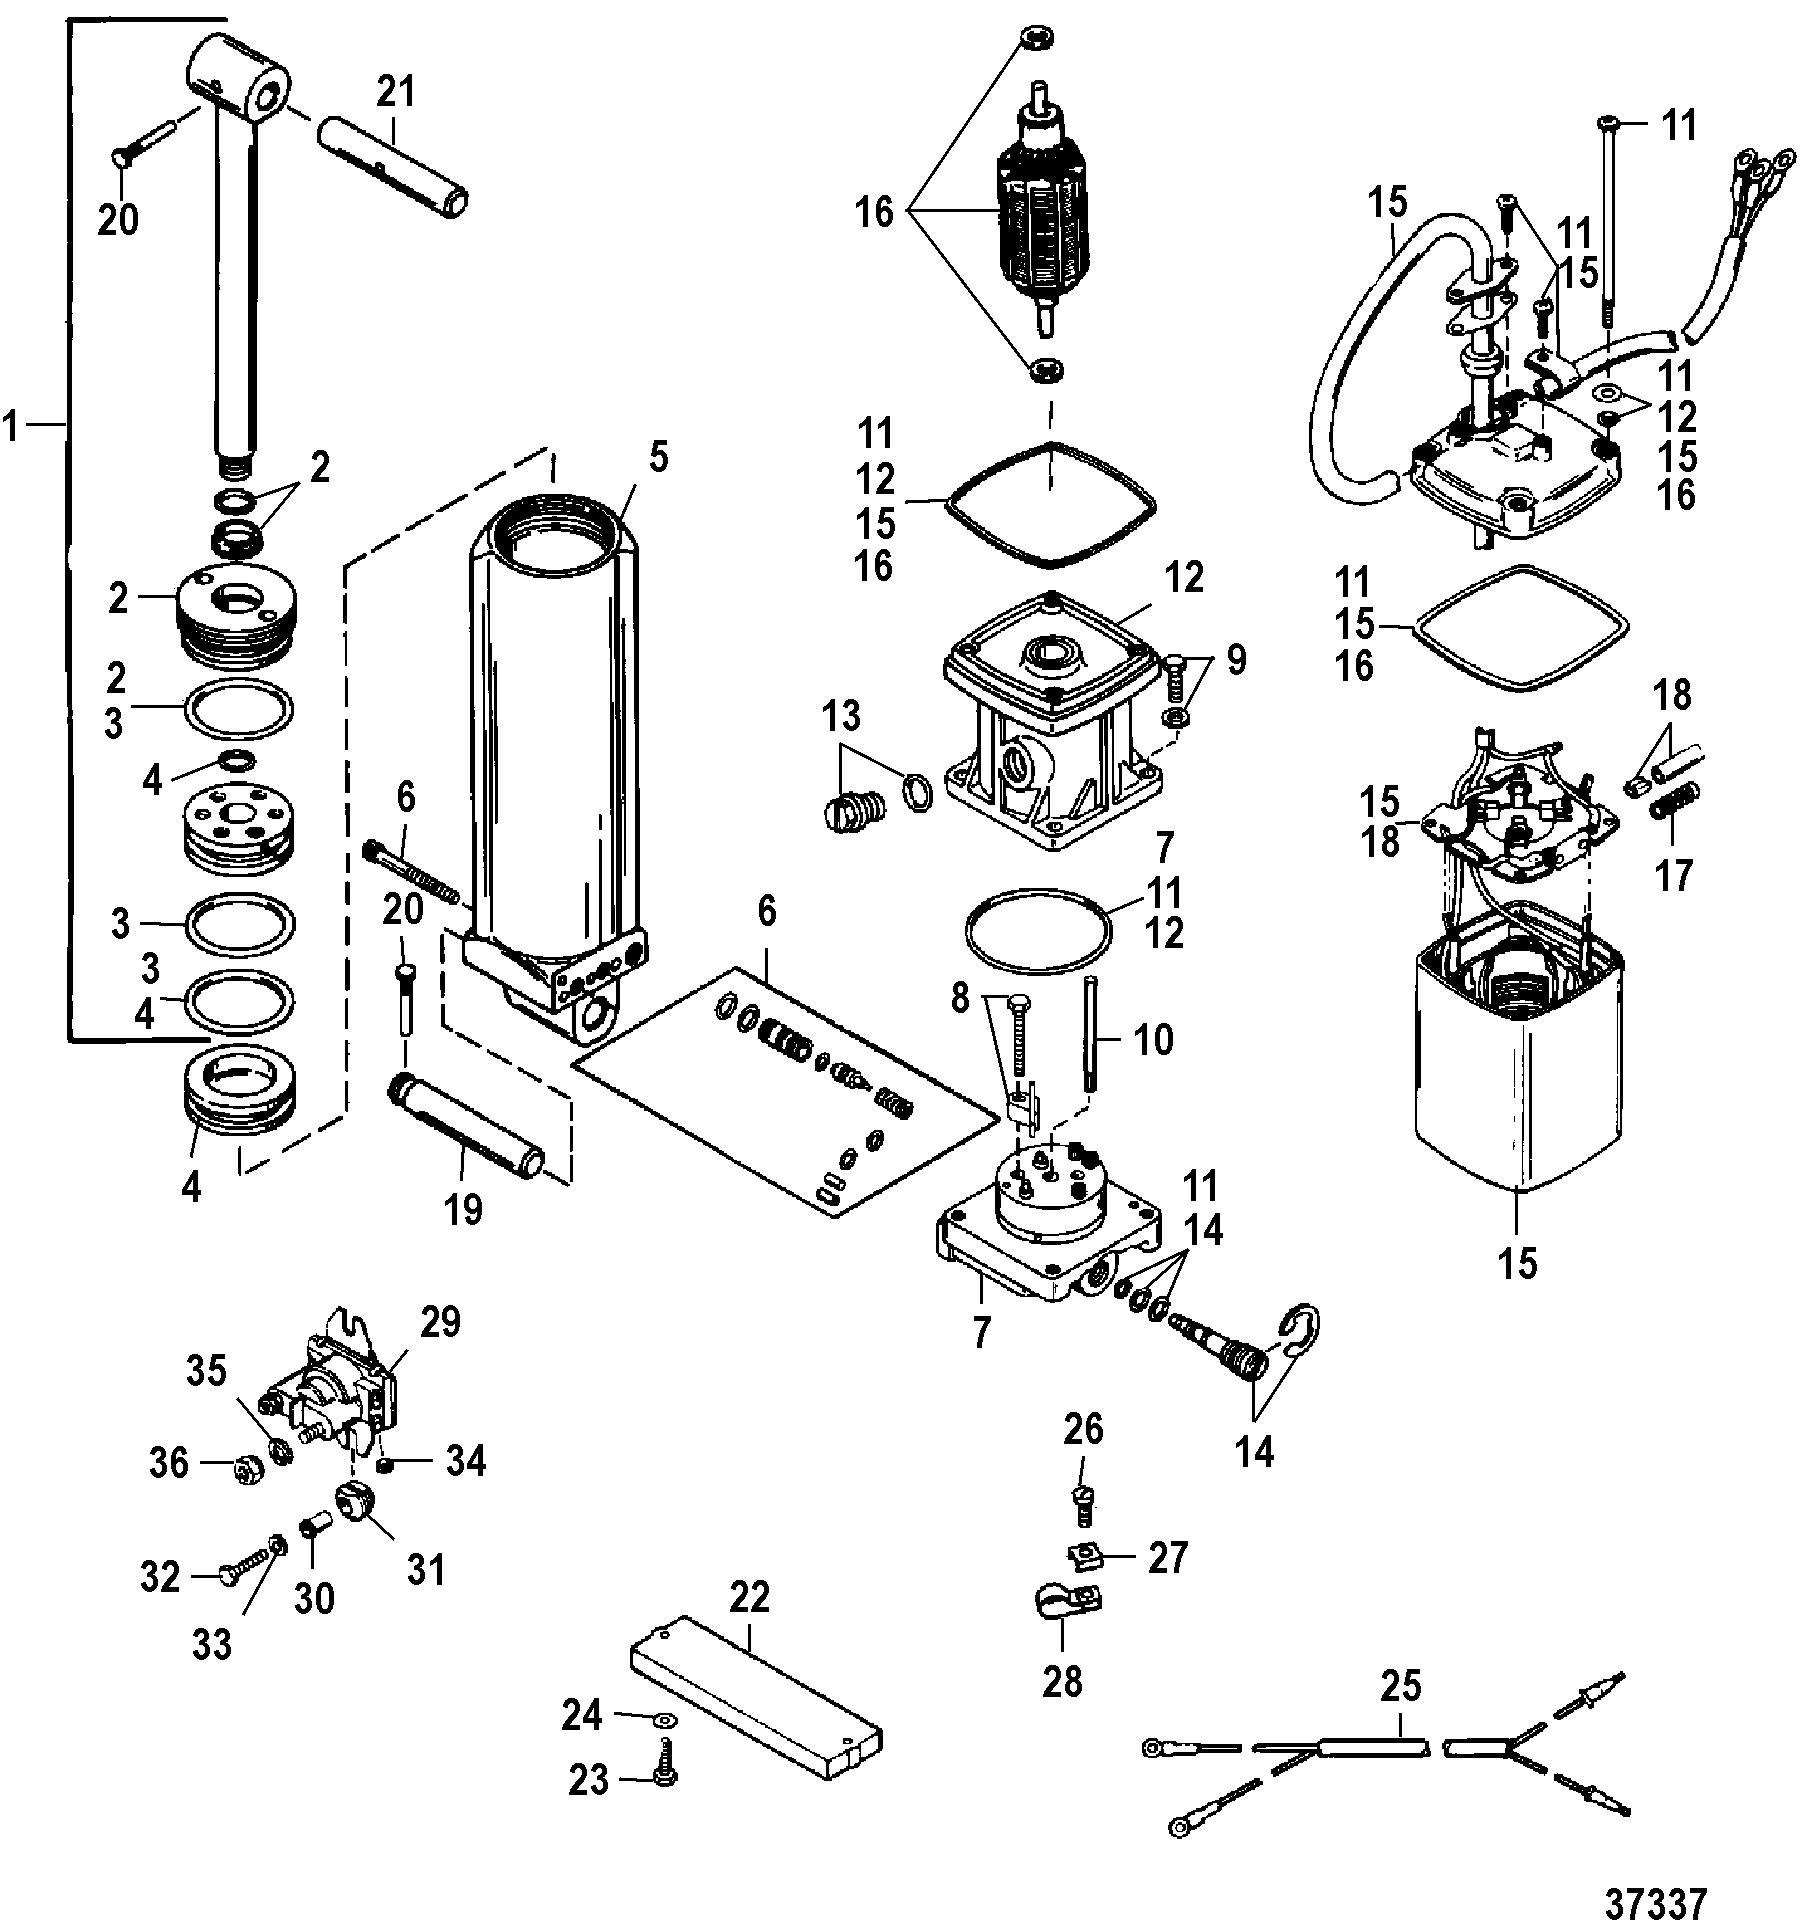 mercury outboard 9793577 thru 0p016999 fuel pump diagram and parts